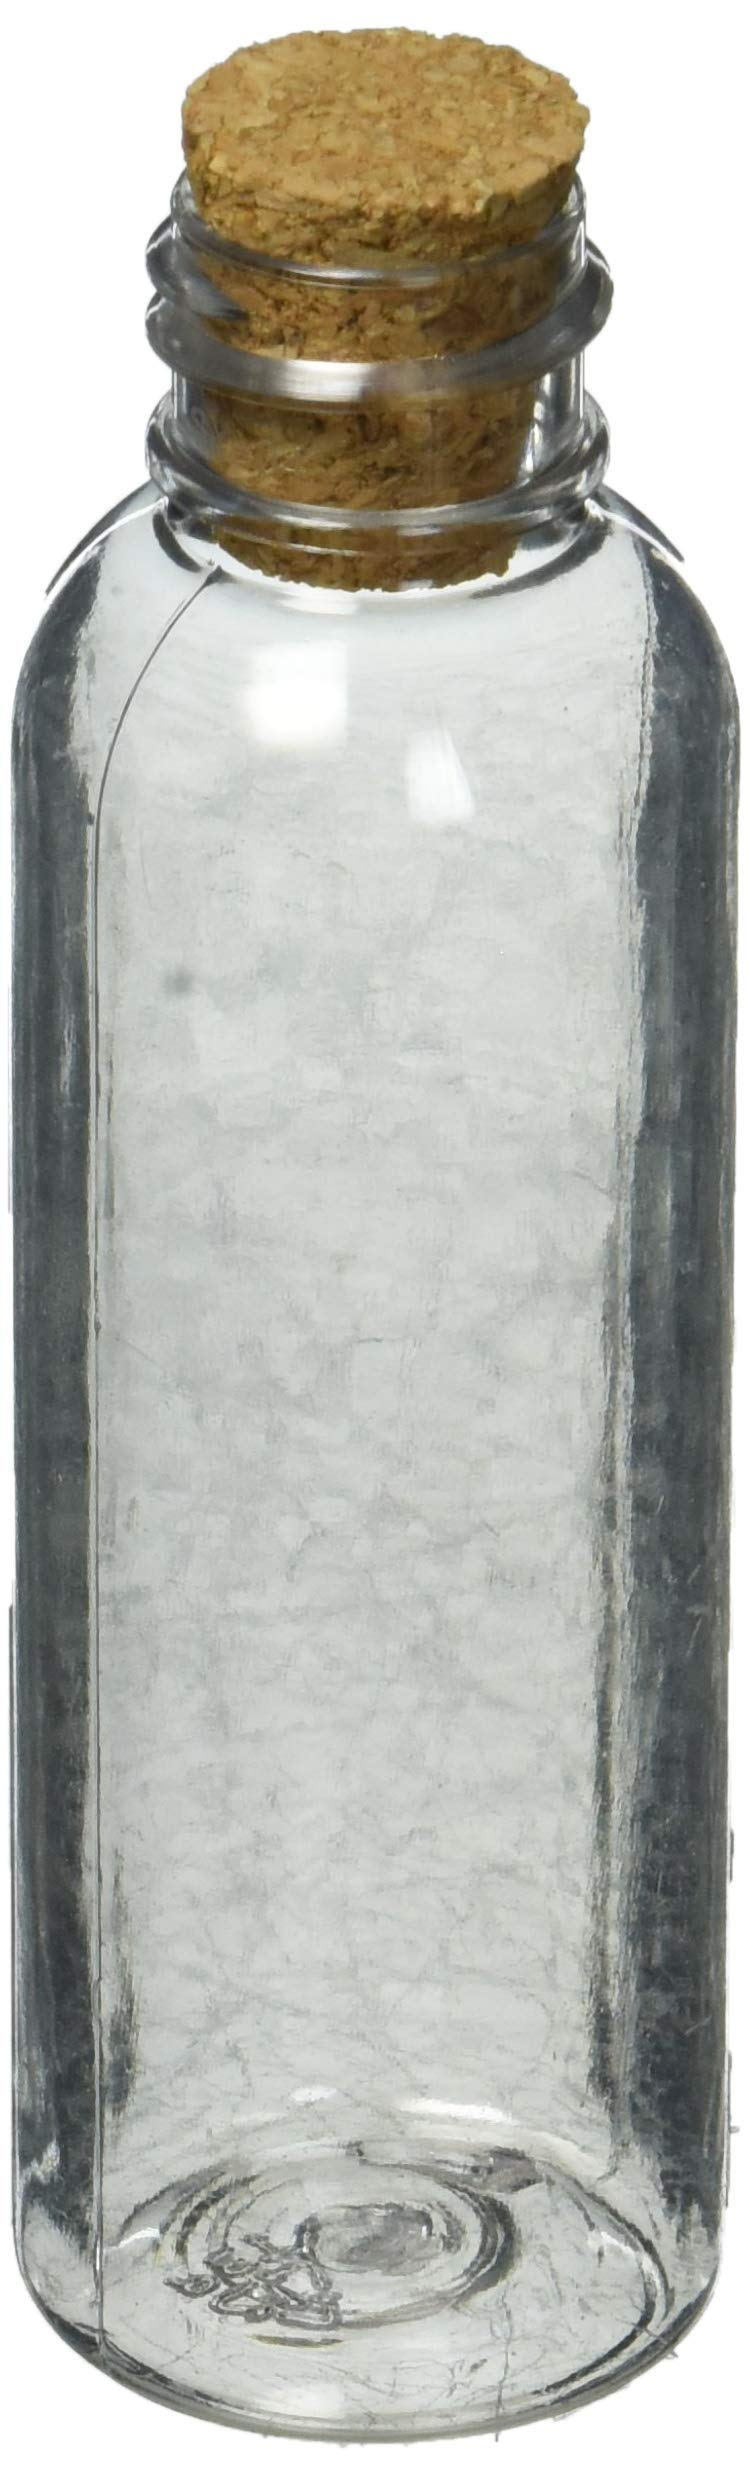 Plastic Sand Art Bottles with Cork (Pack of 24)